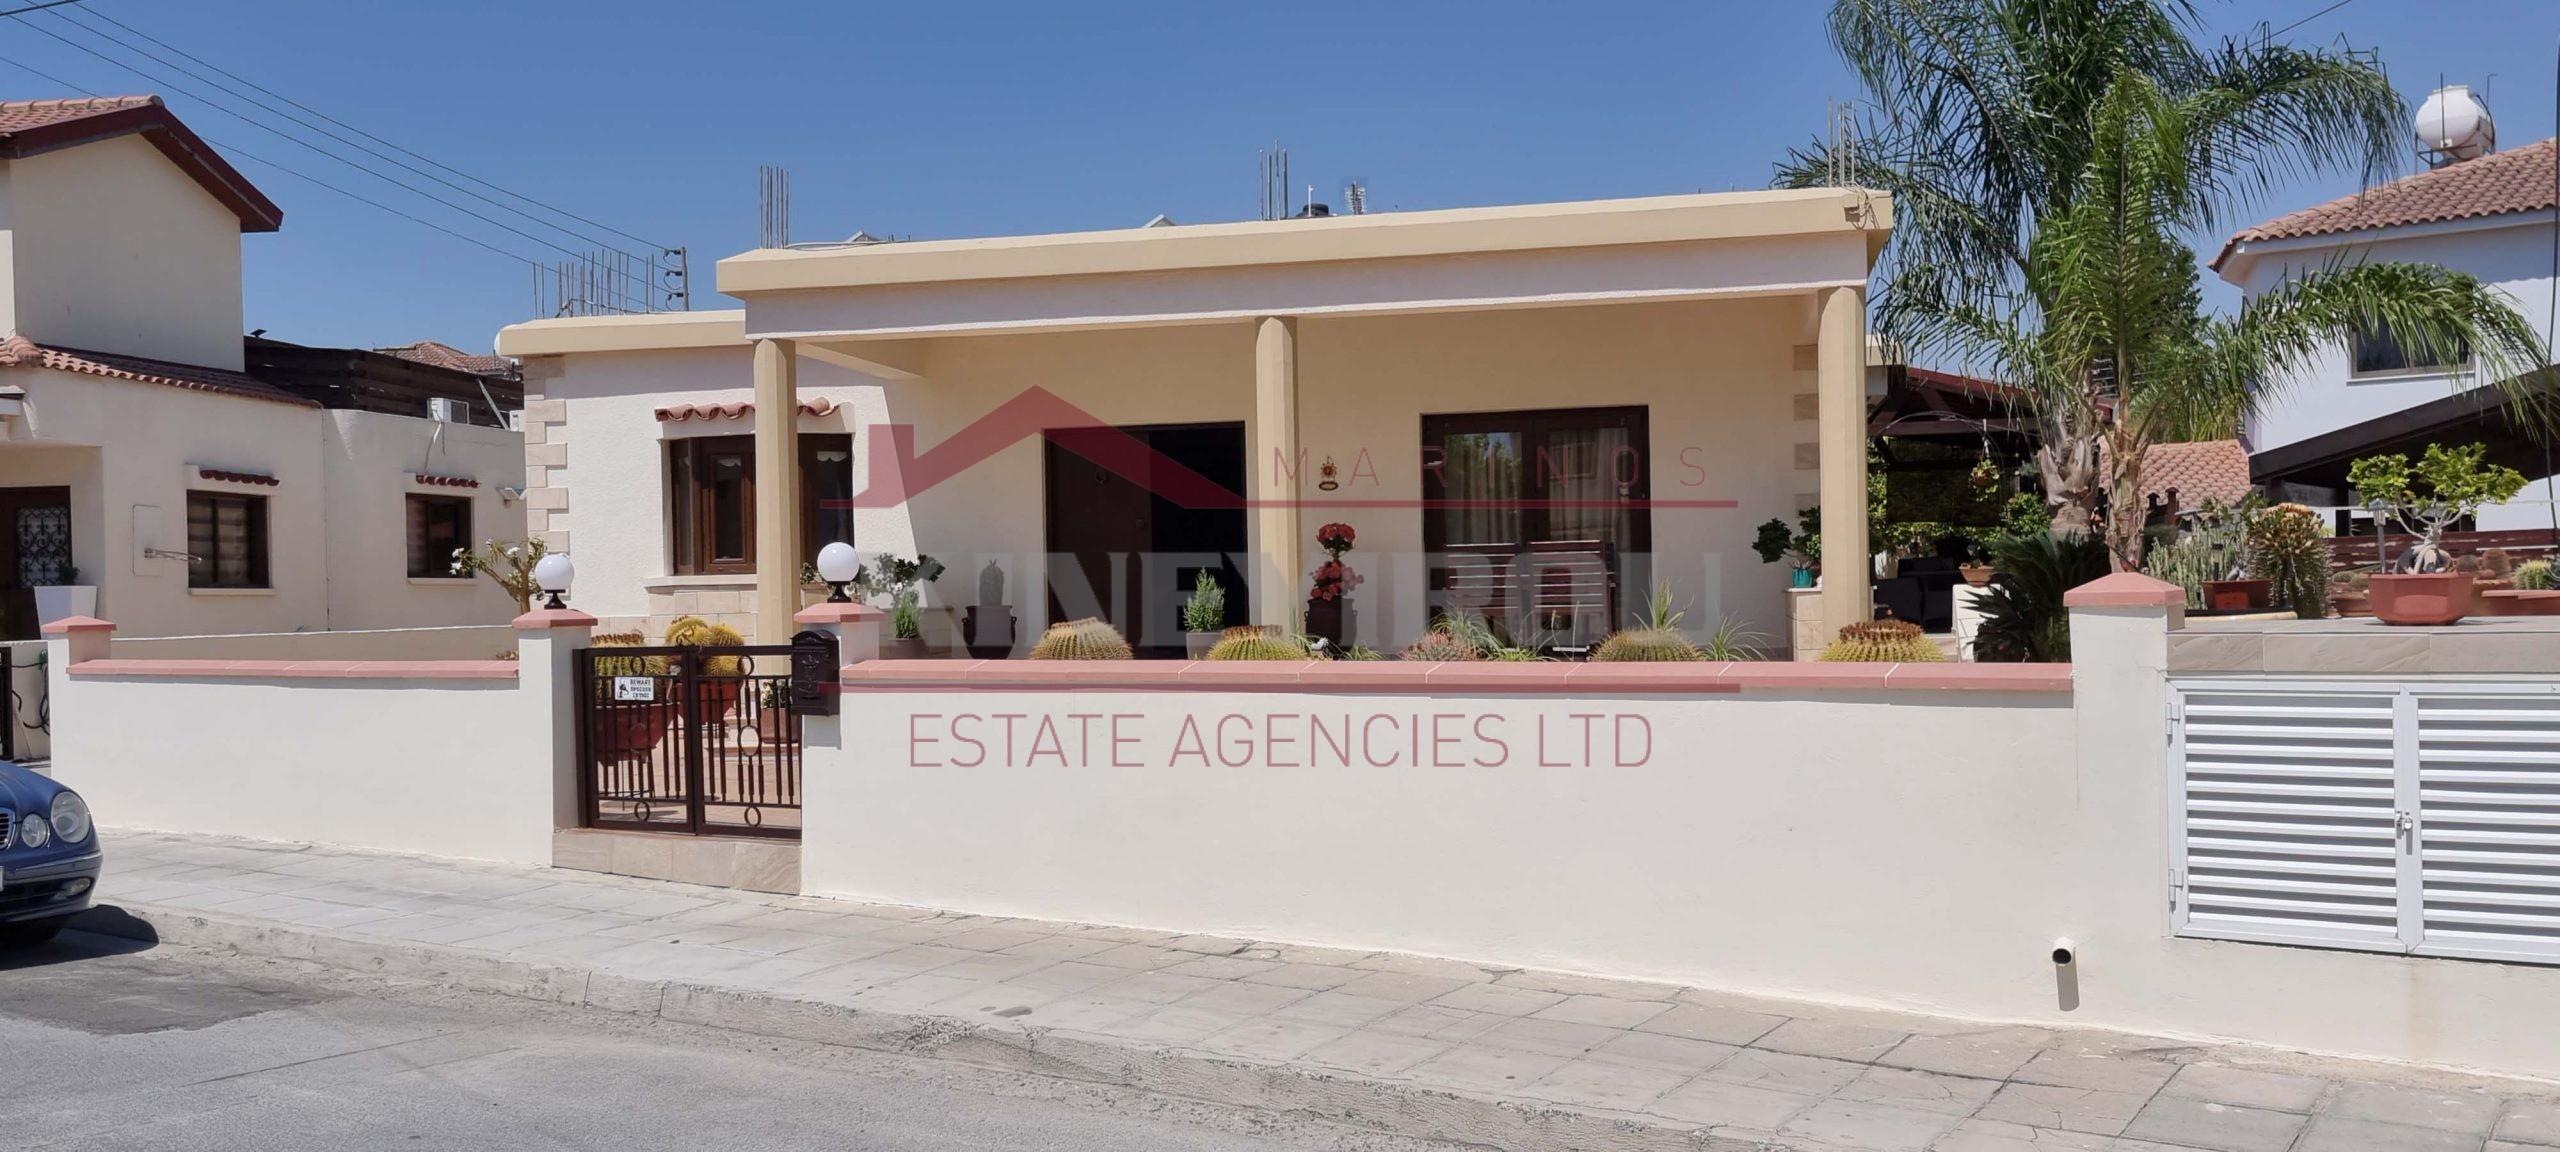 4 Bedroom House in Aradippou, Larnaca